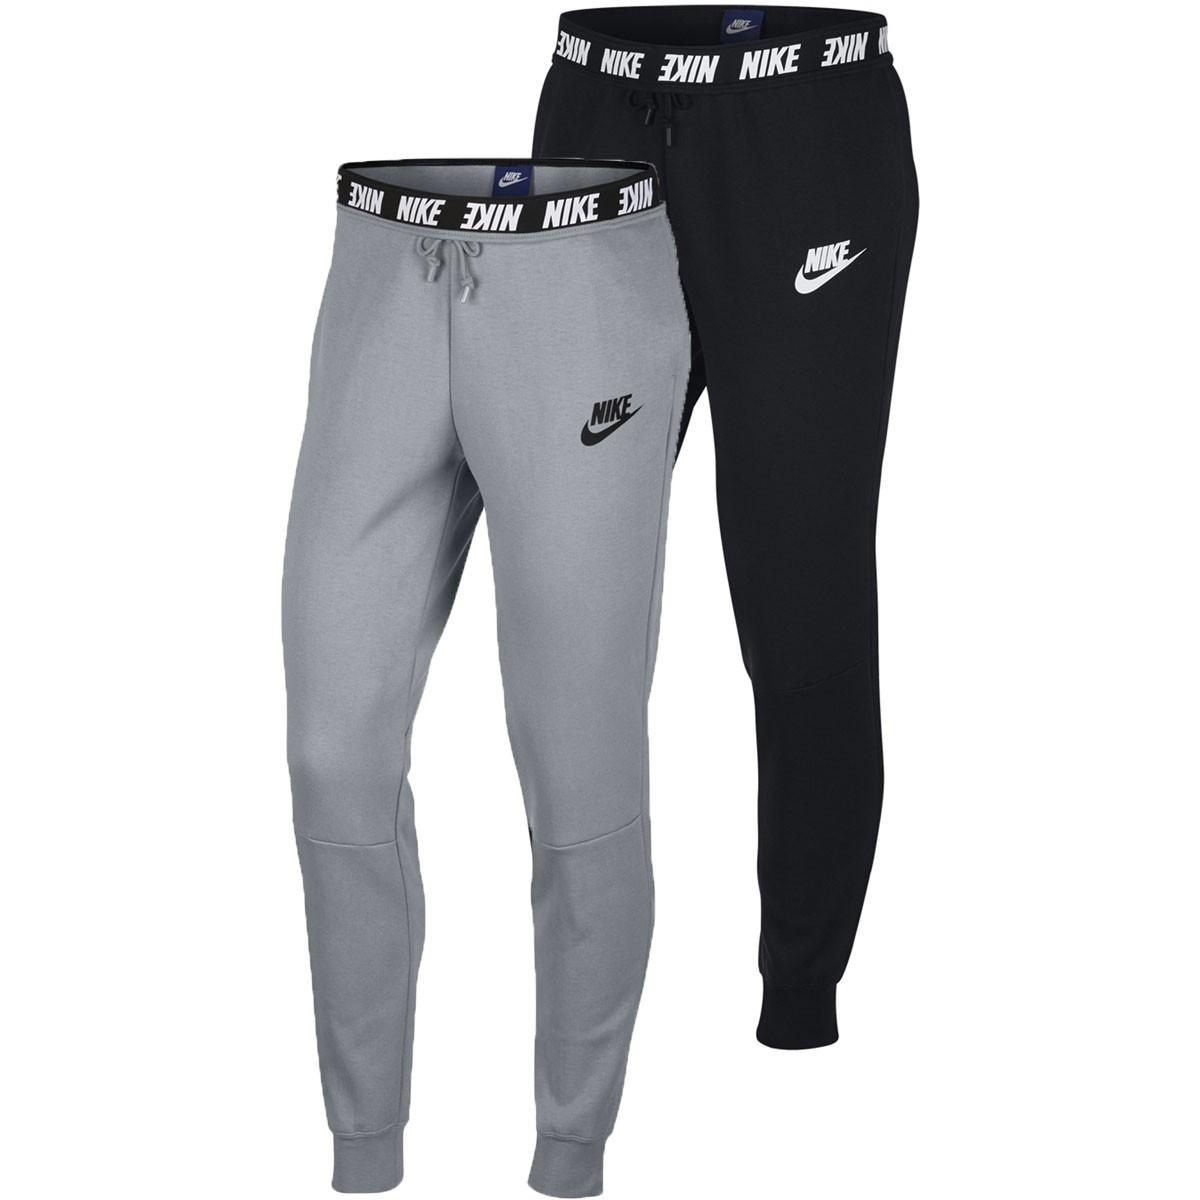 15 Advance Mujer Nike Tennispro Sportswear Pantalón wH8I1qpx